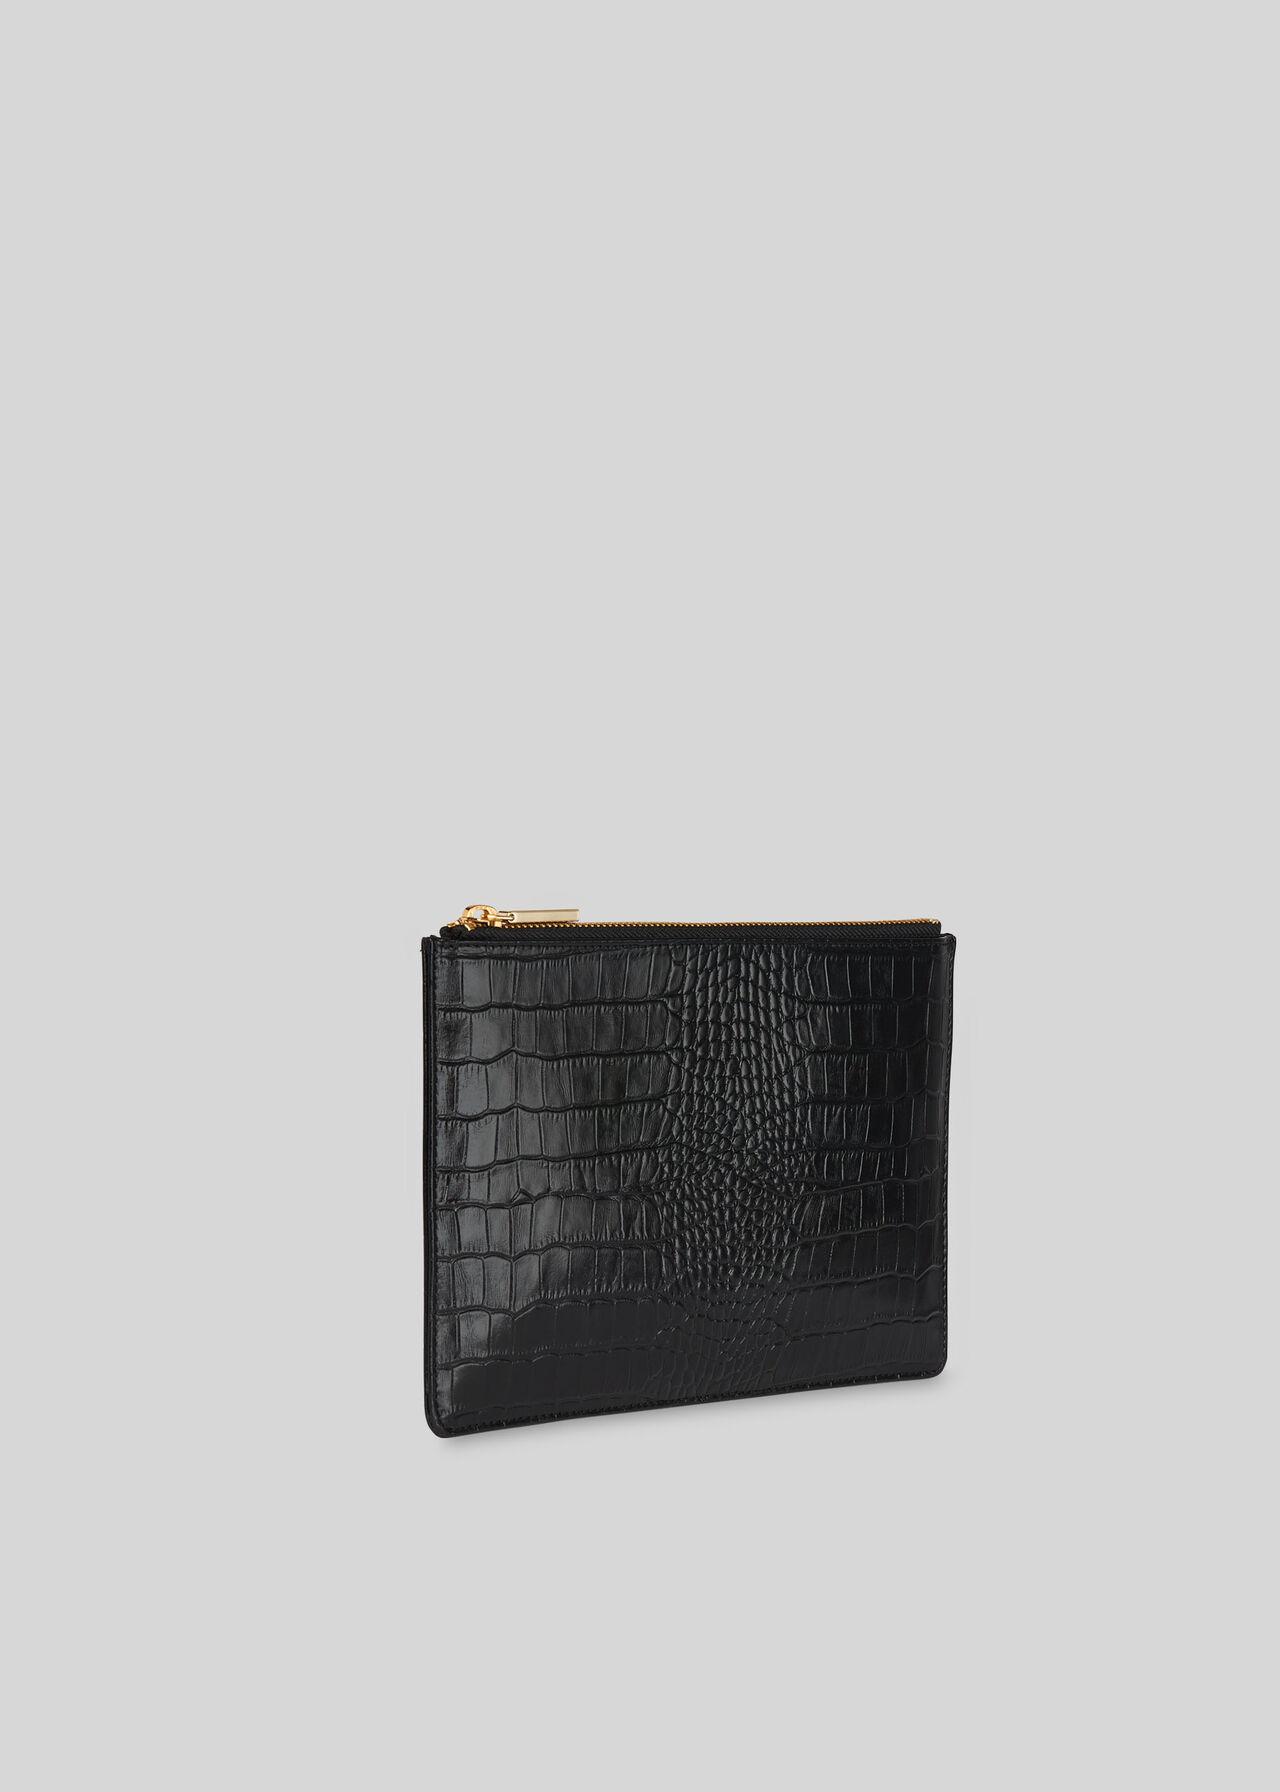 Shiny Croc Small Clutch Black